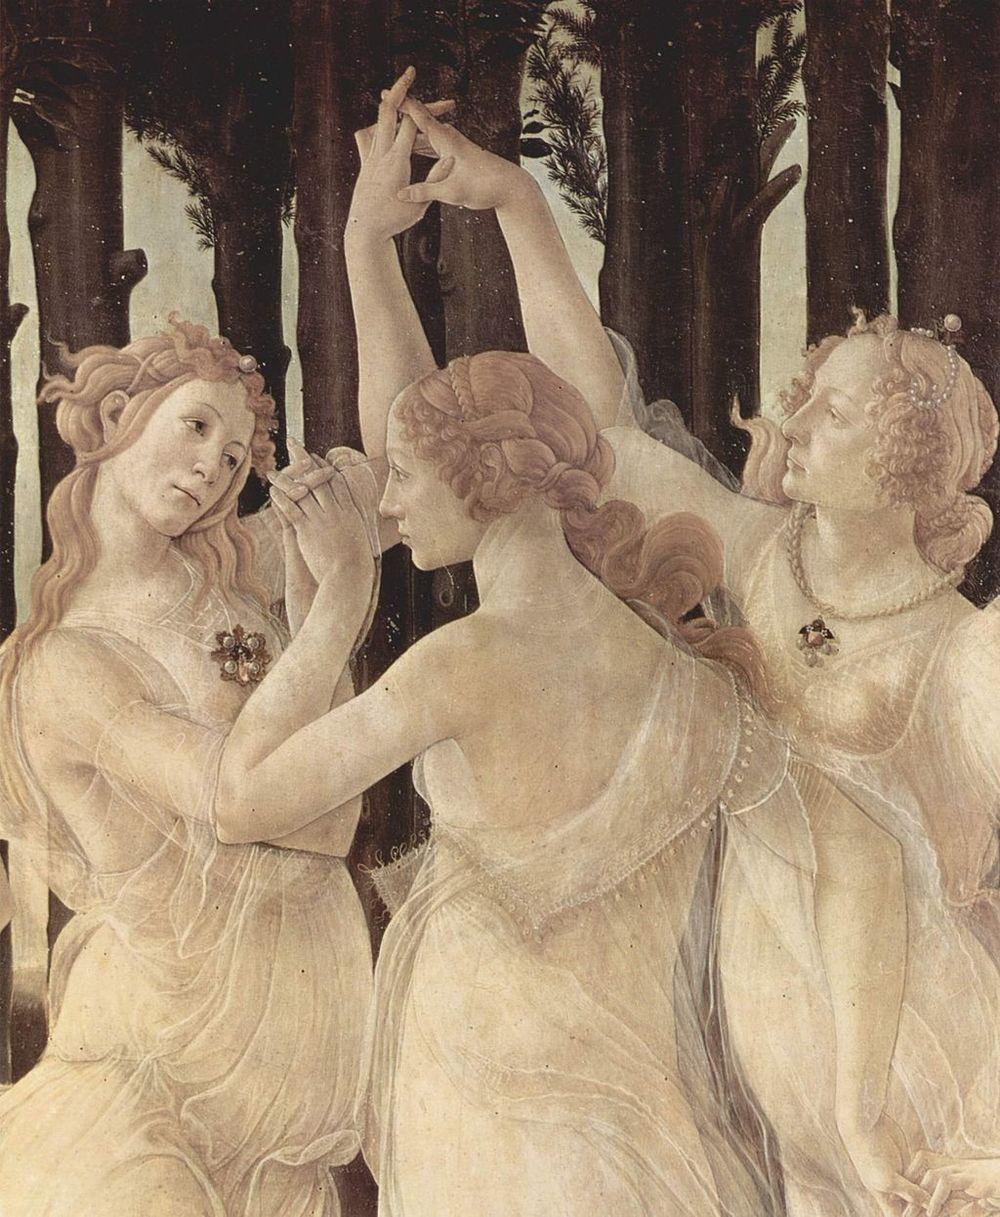 Sandro Botticelli,  Primavera  (detail:  The Three Graces ), c. 1482, Uffizi Gallery, Florence.